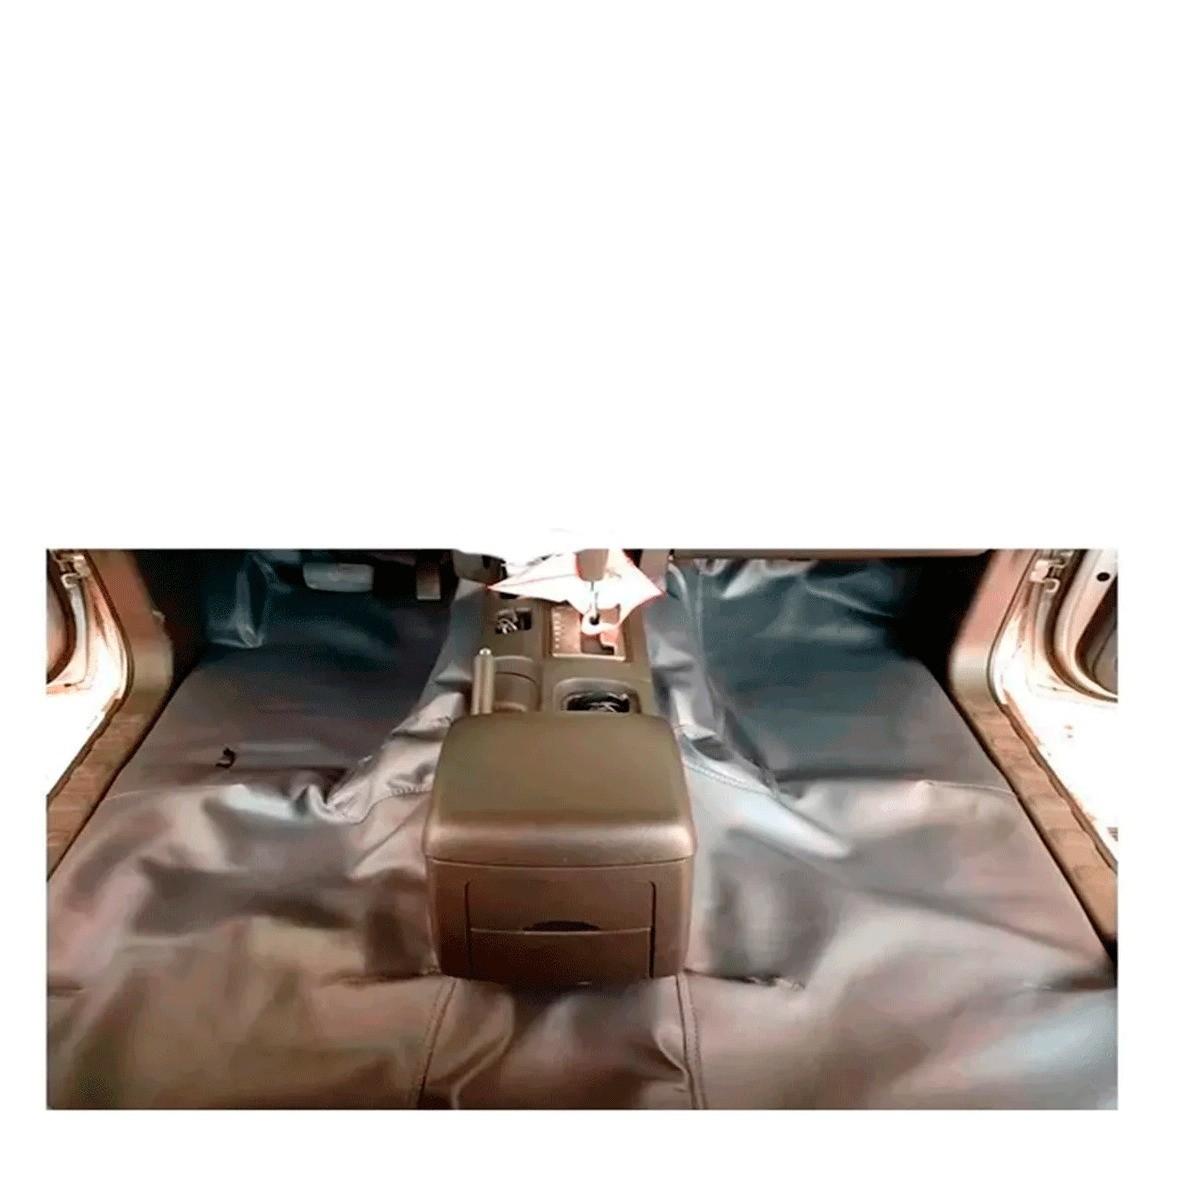 Tapete Automotivo Assoalho Emborrachado Bidim Volkswagen Parati Bola